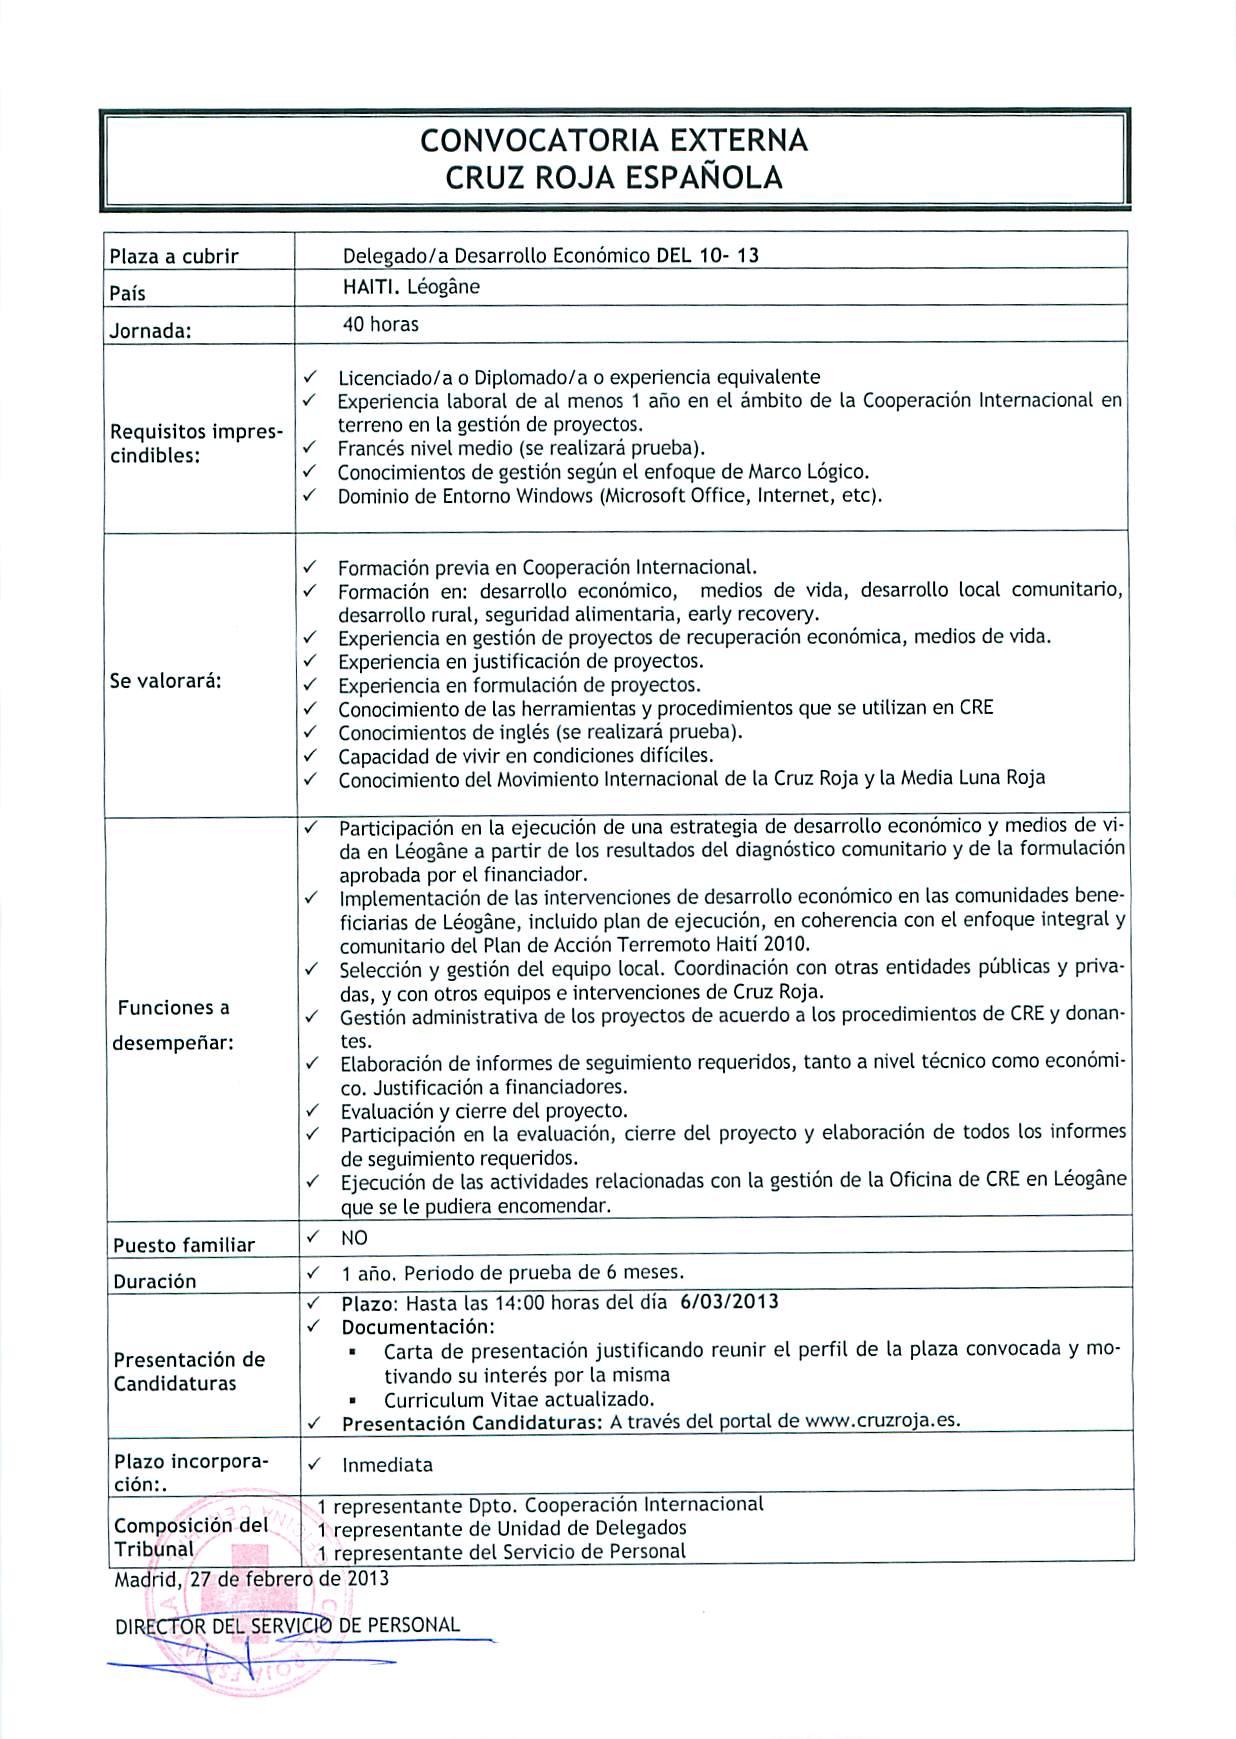 CONVOCATORIAS DE EMPLEO CRUZ ROJA INTERNACIONAL; HAITI Y BURUNDI ...